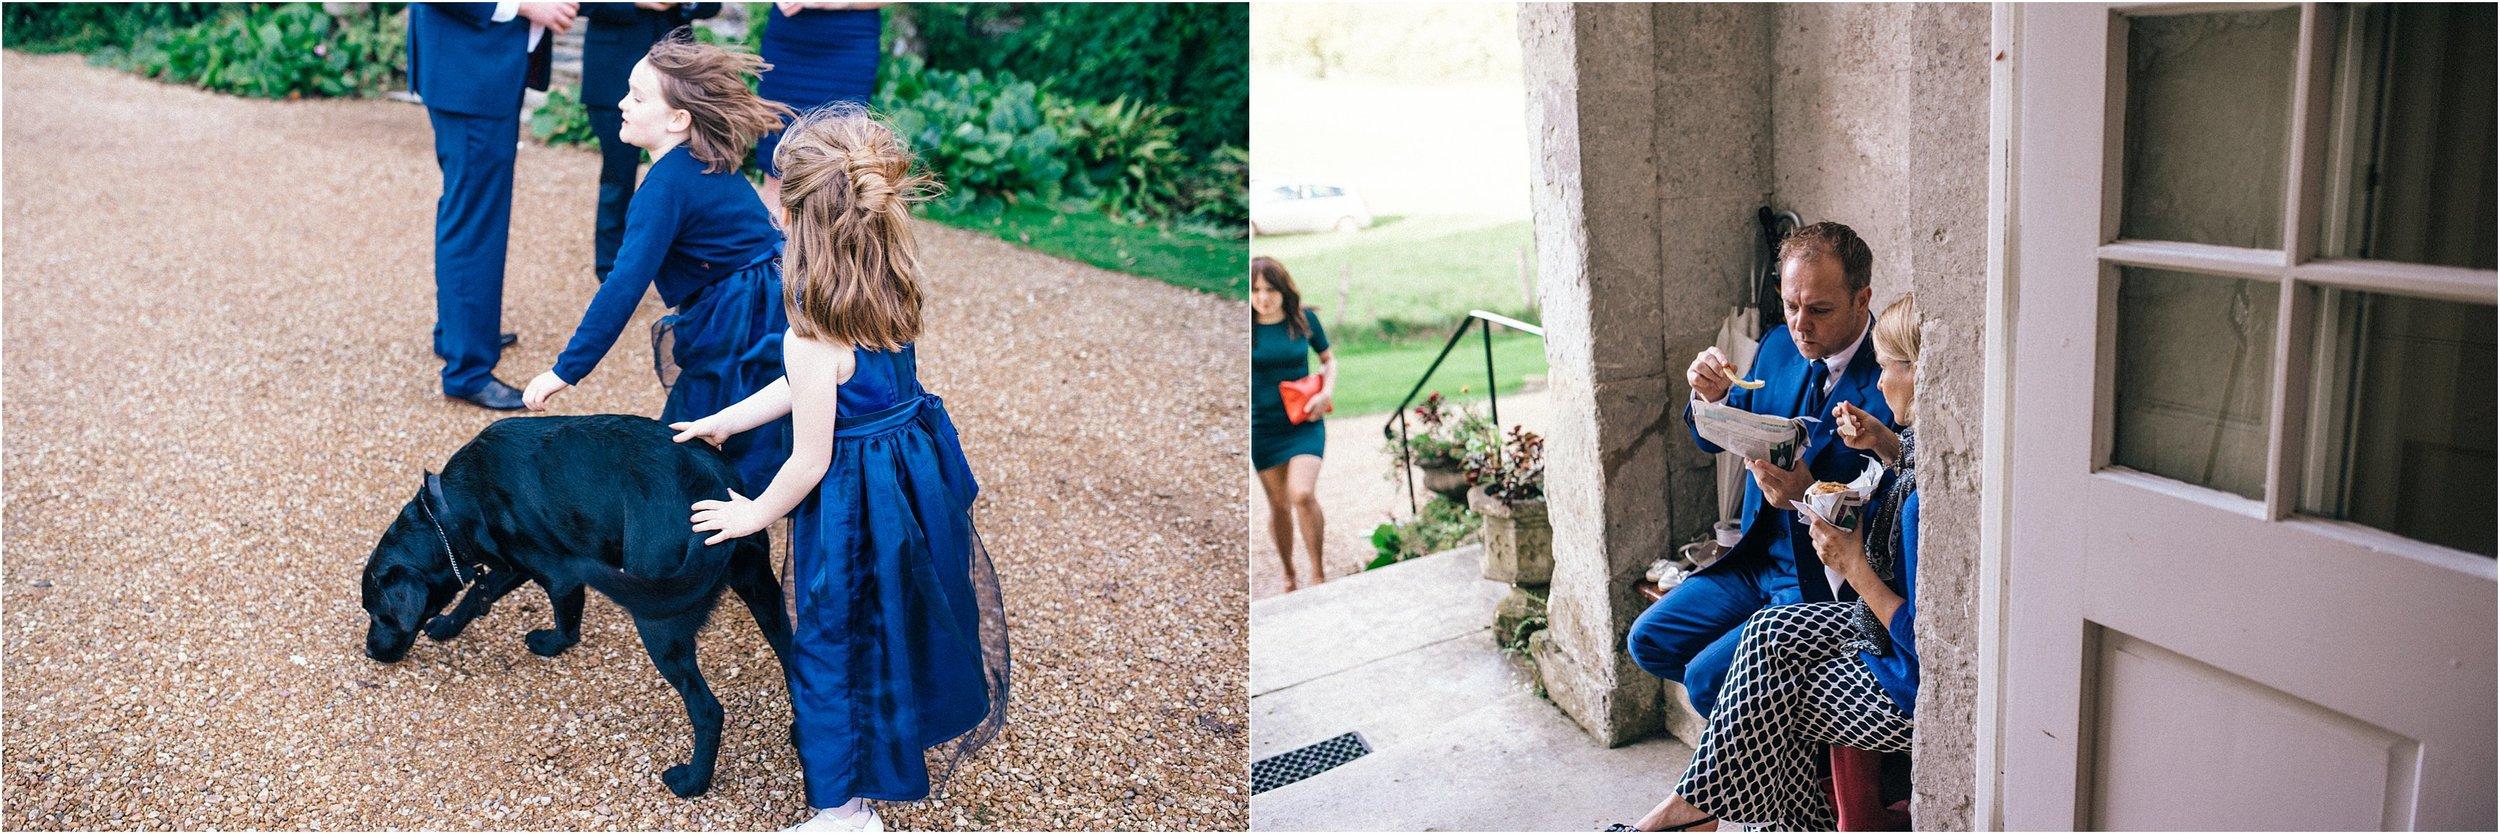 Northcourt House Wedding_0047.jpg